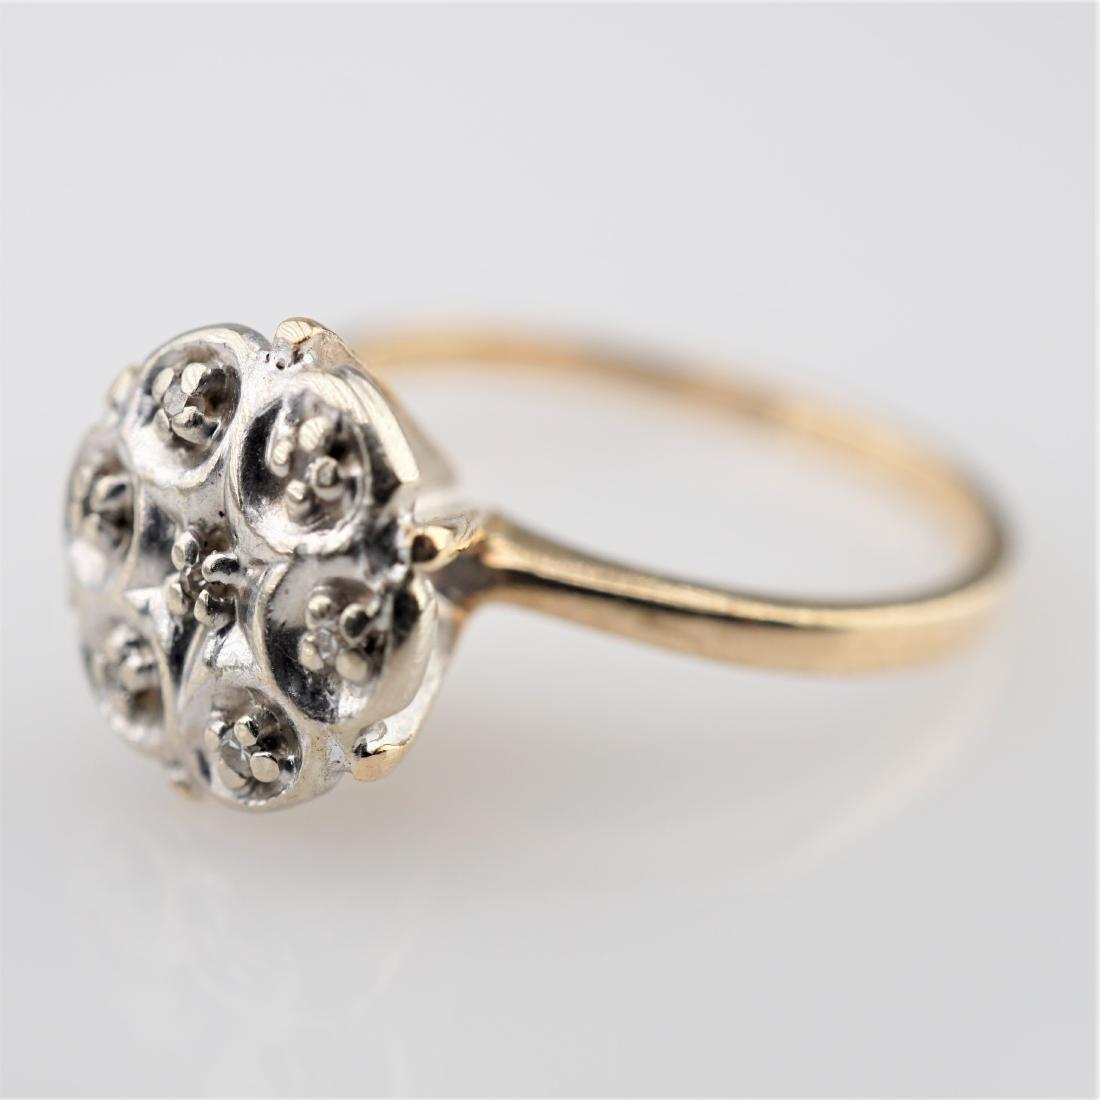 WG/YG Floral Ring sz 5.5